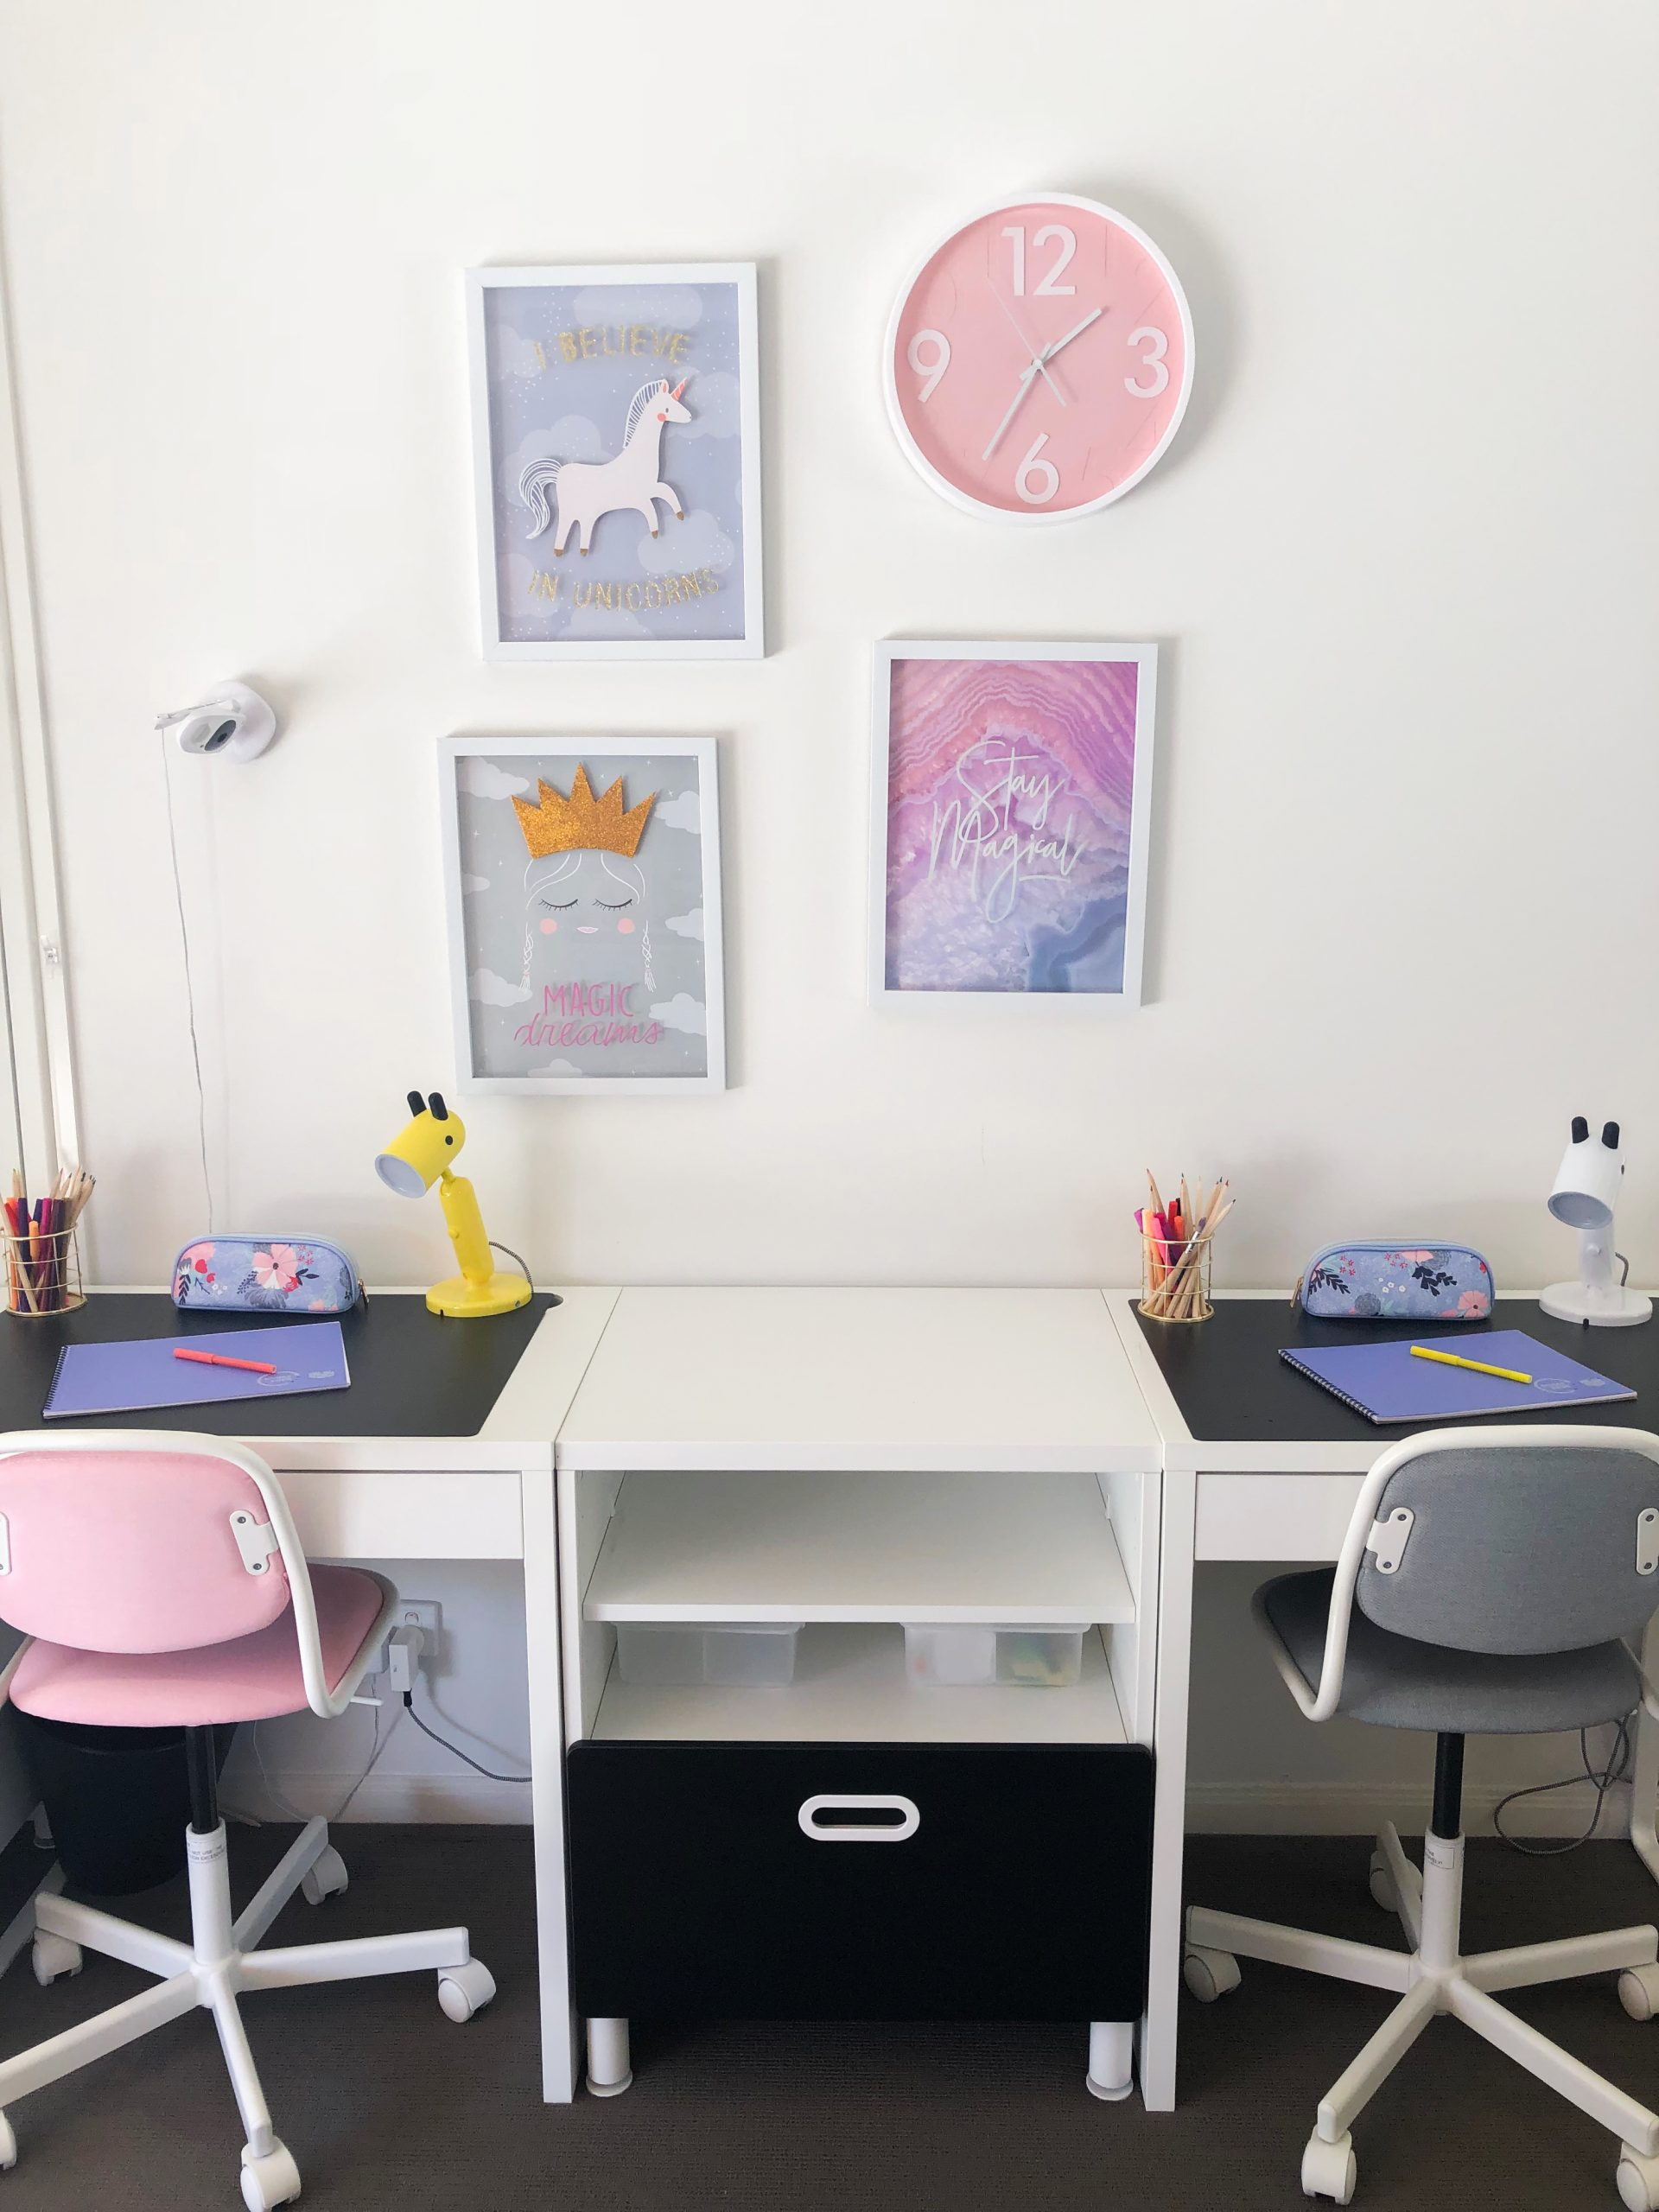 https://www.ivyandfinch.com.au/wp-content/uploads/2021/02/Interior-Design-Hope-Island-Kids-Study-scaled.jpg